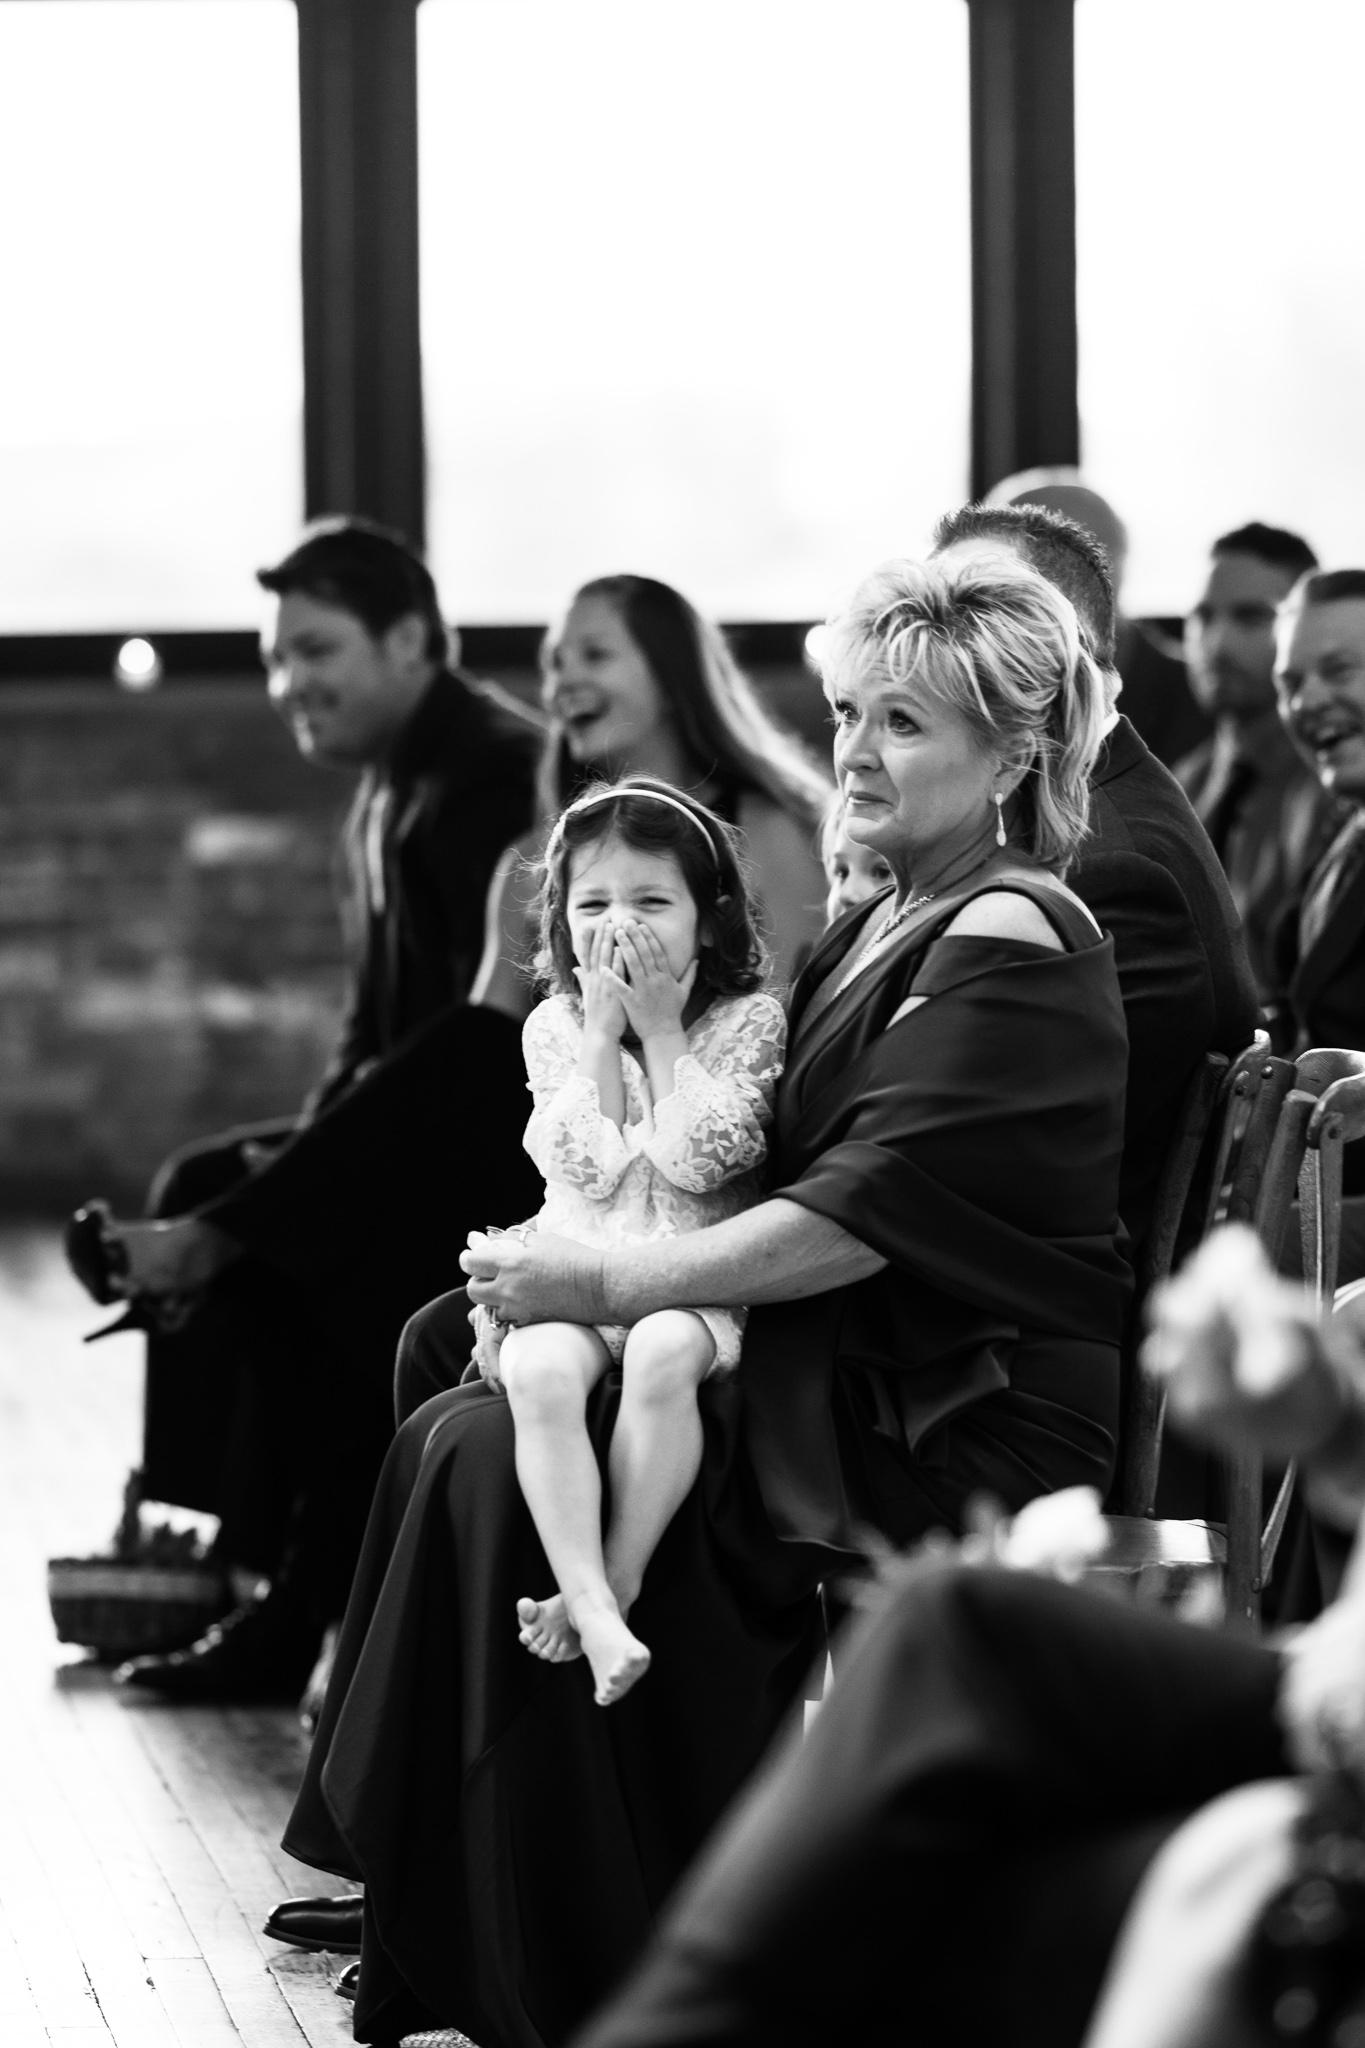 bridgeport-art-center-wedding-photos-25.jpg